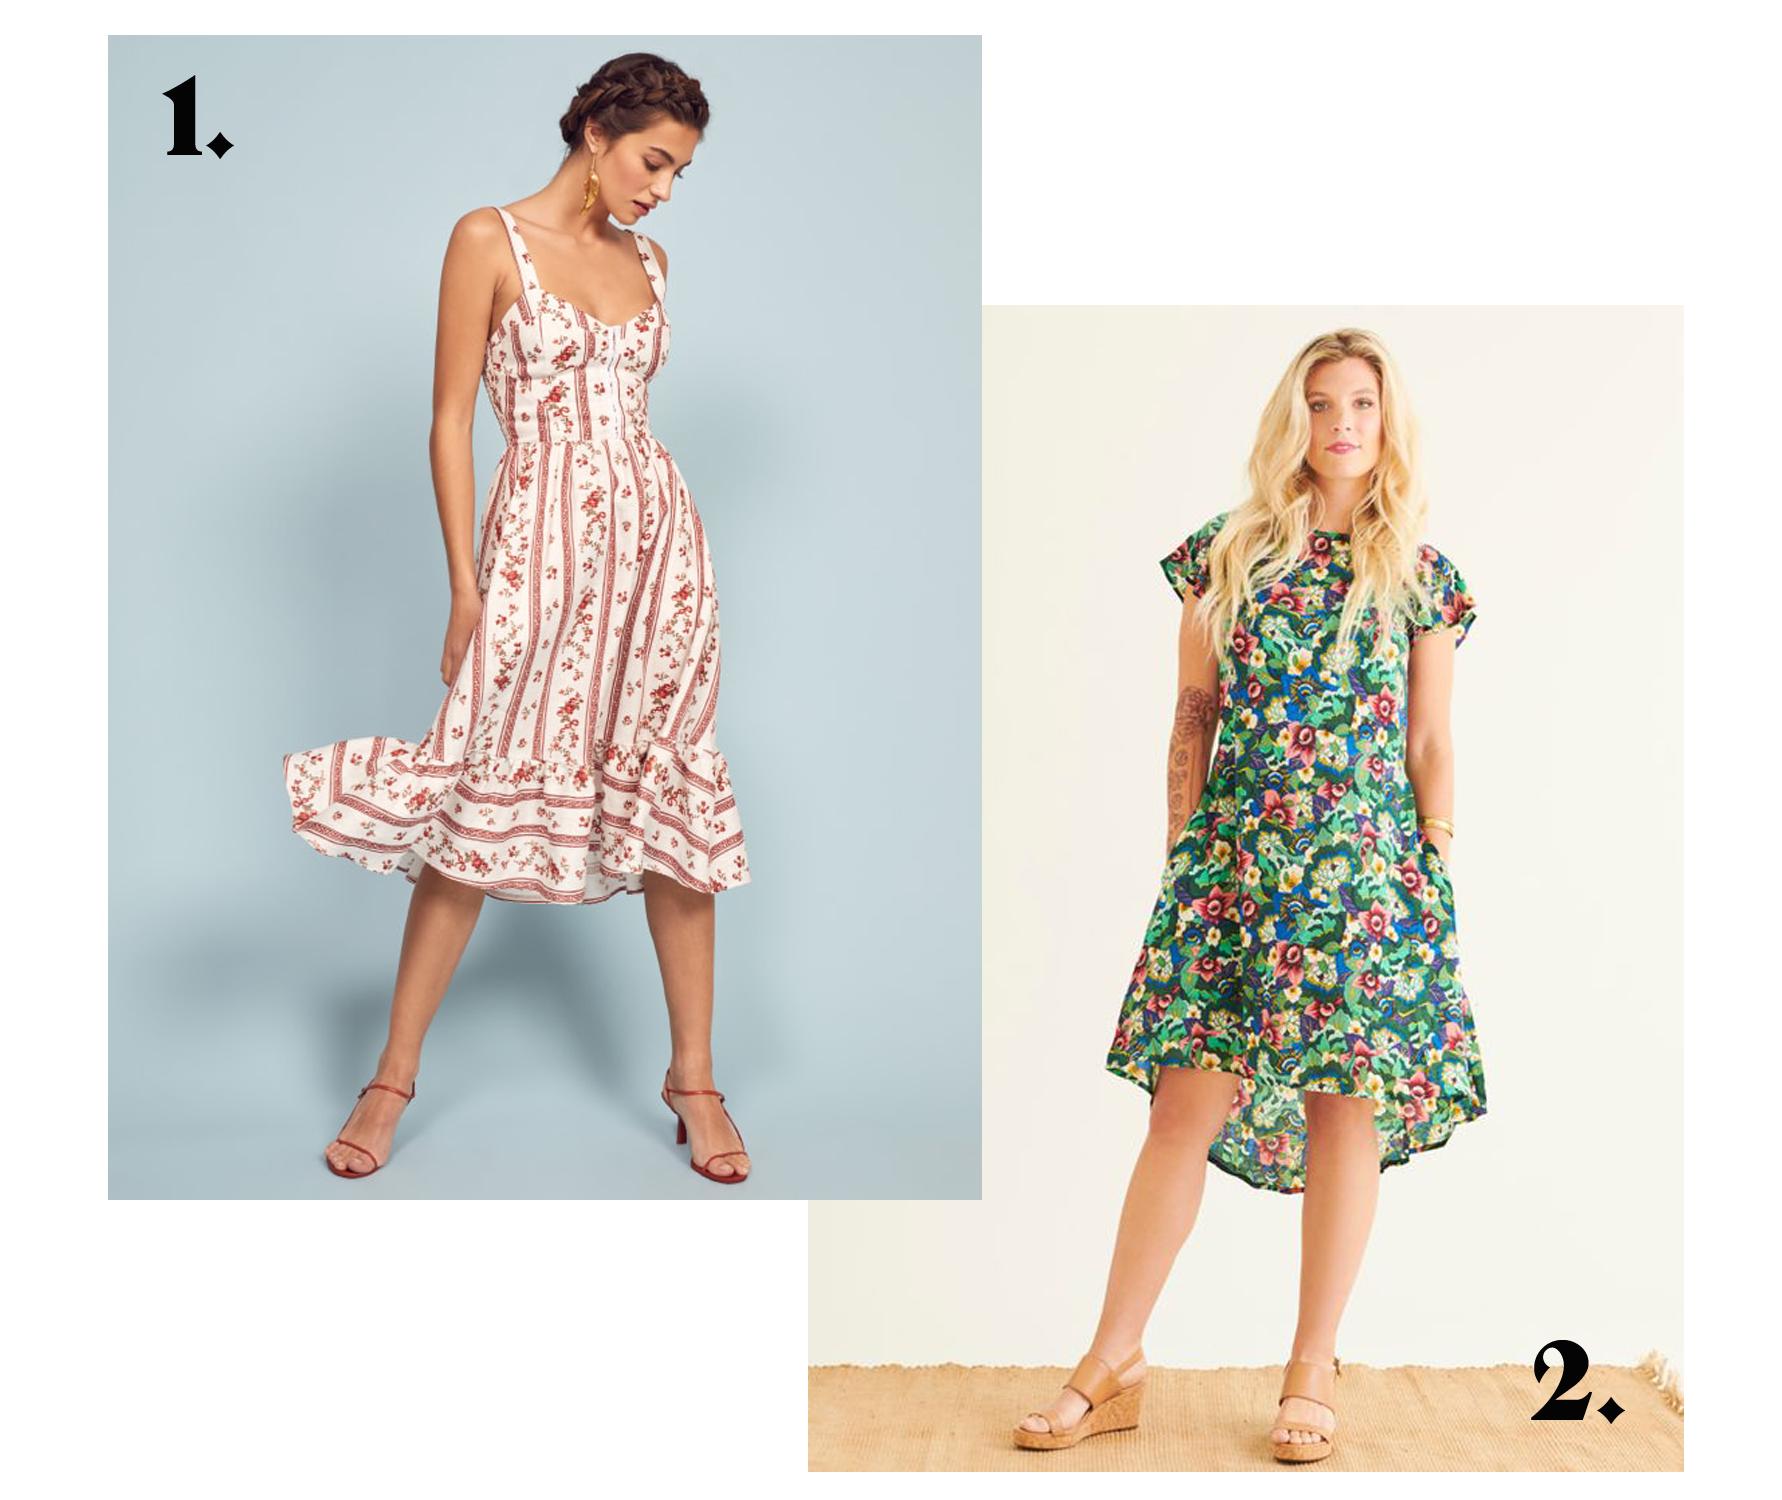 dresses-1.png